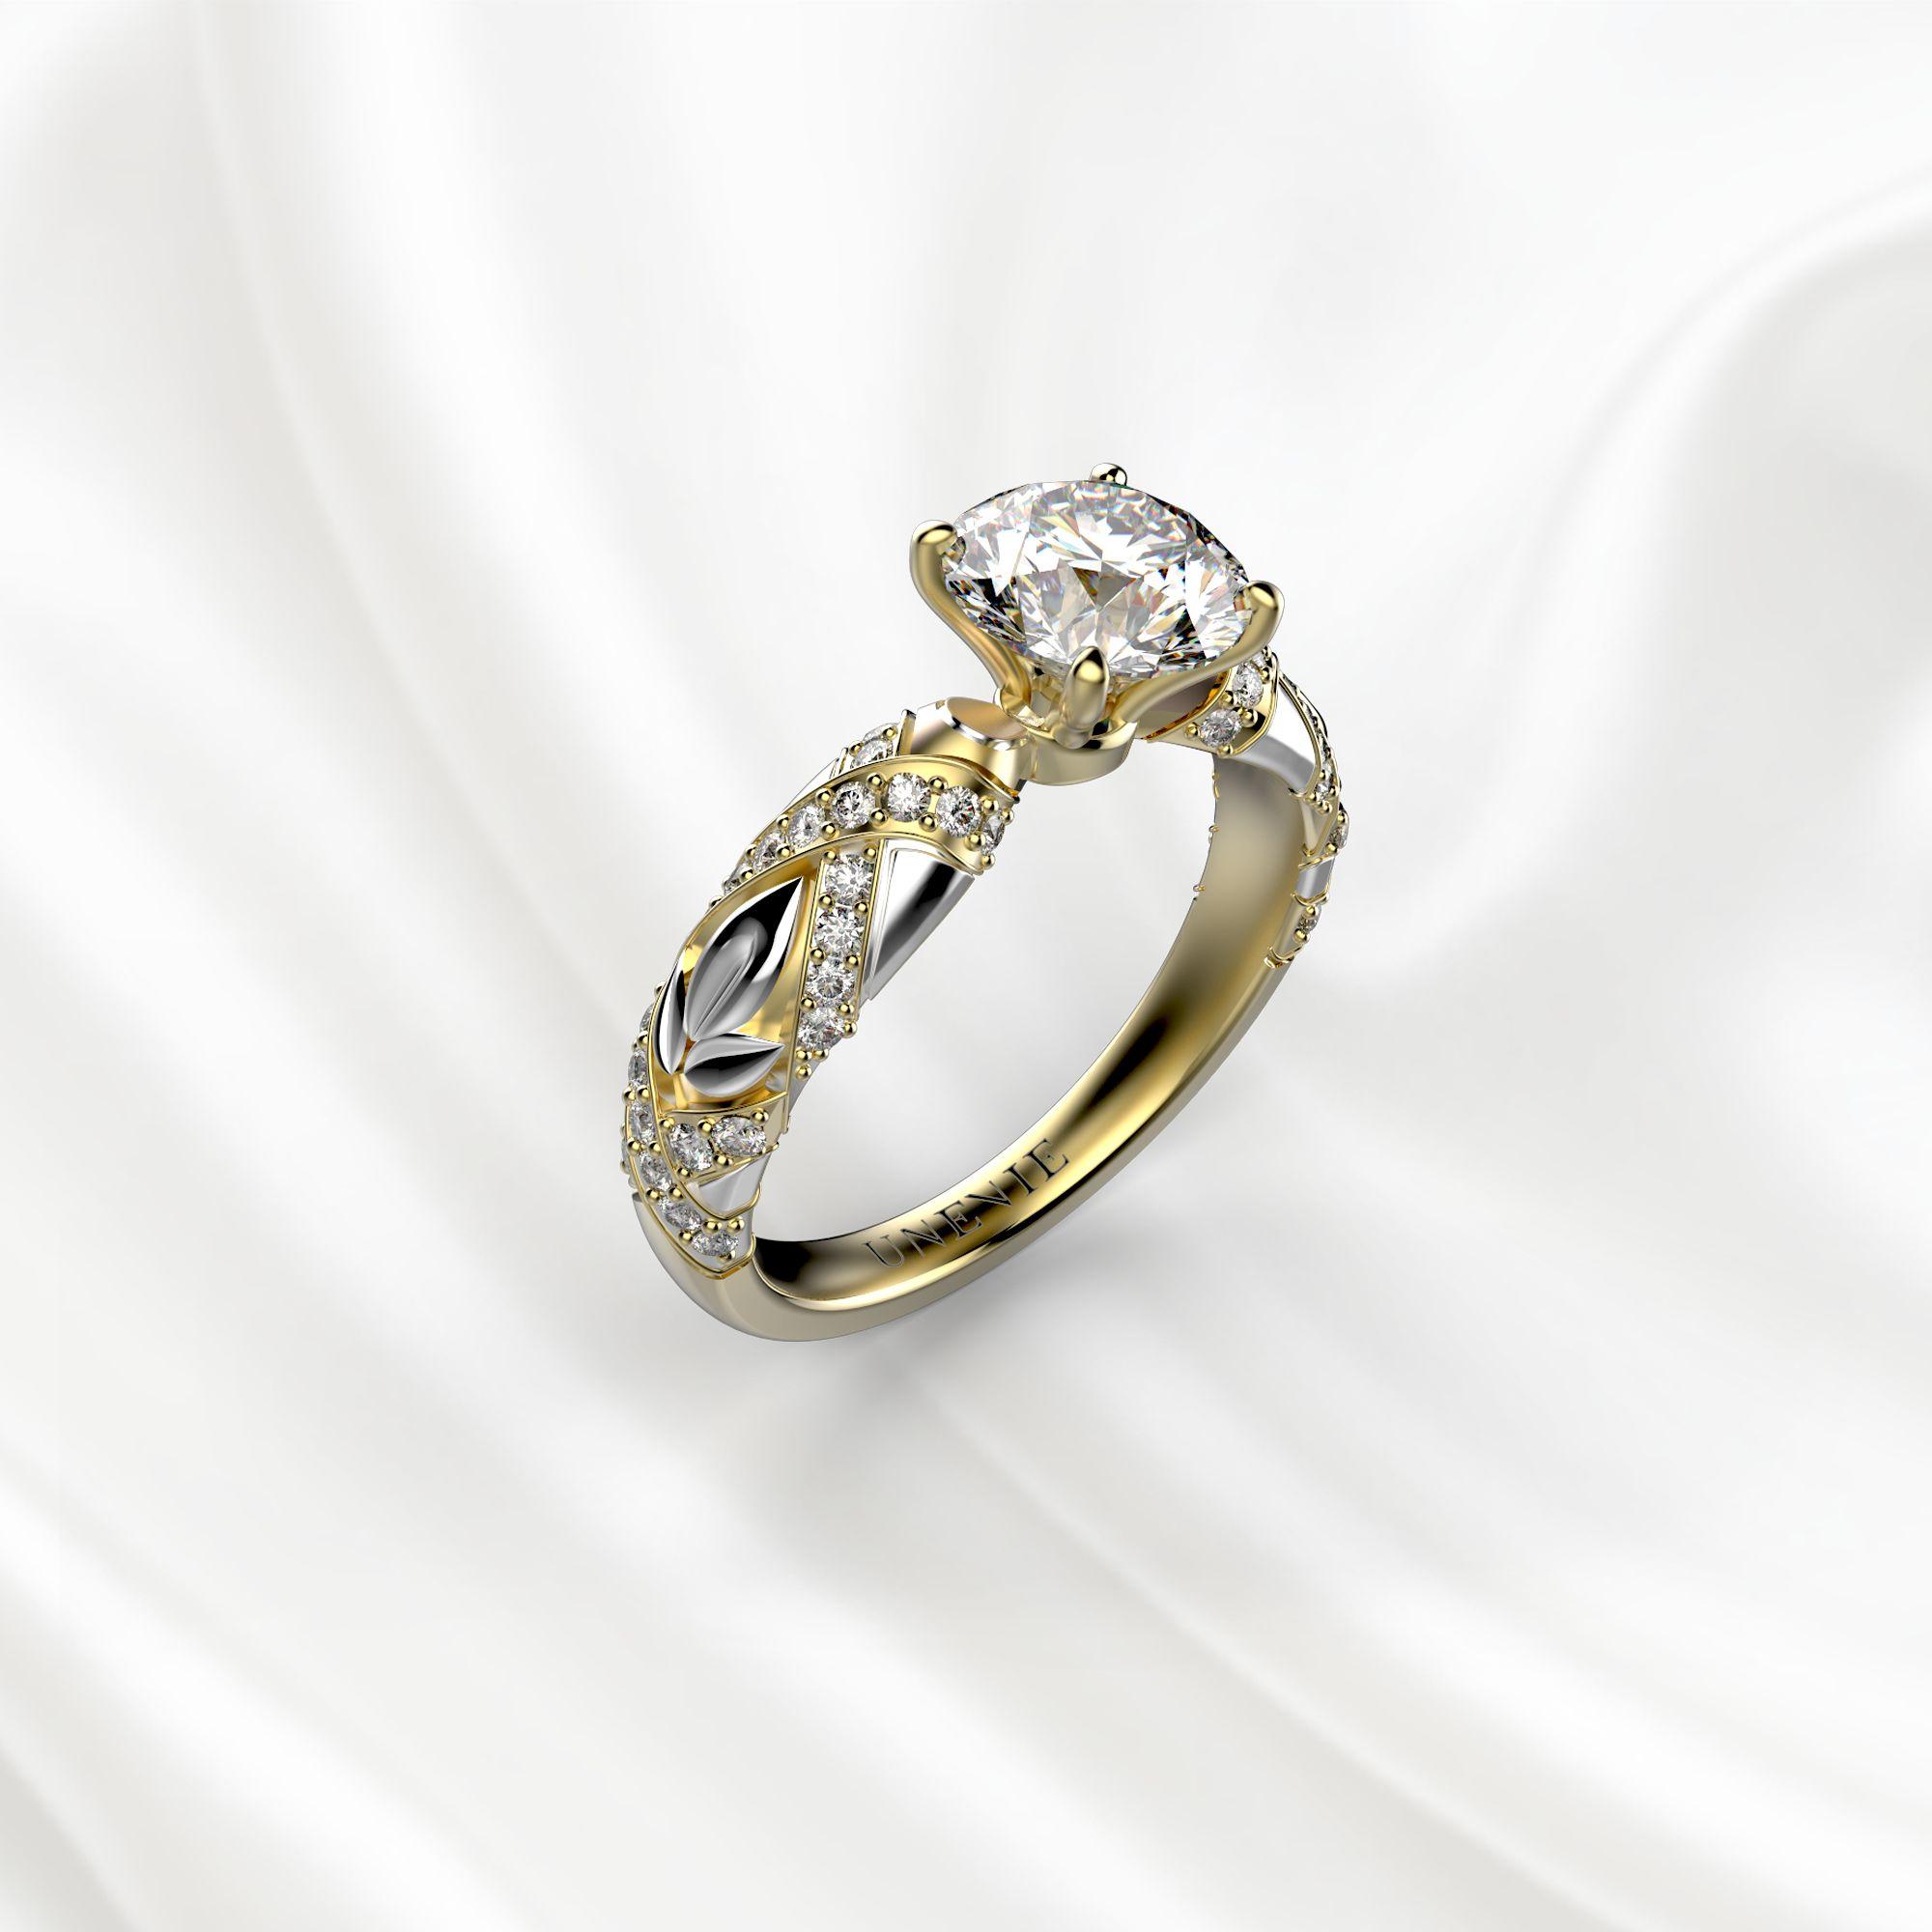 N17 Помолвочное кольцо из желто-белого золота c 51 бриллиантом